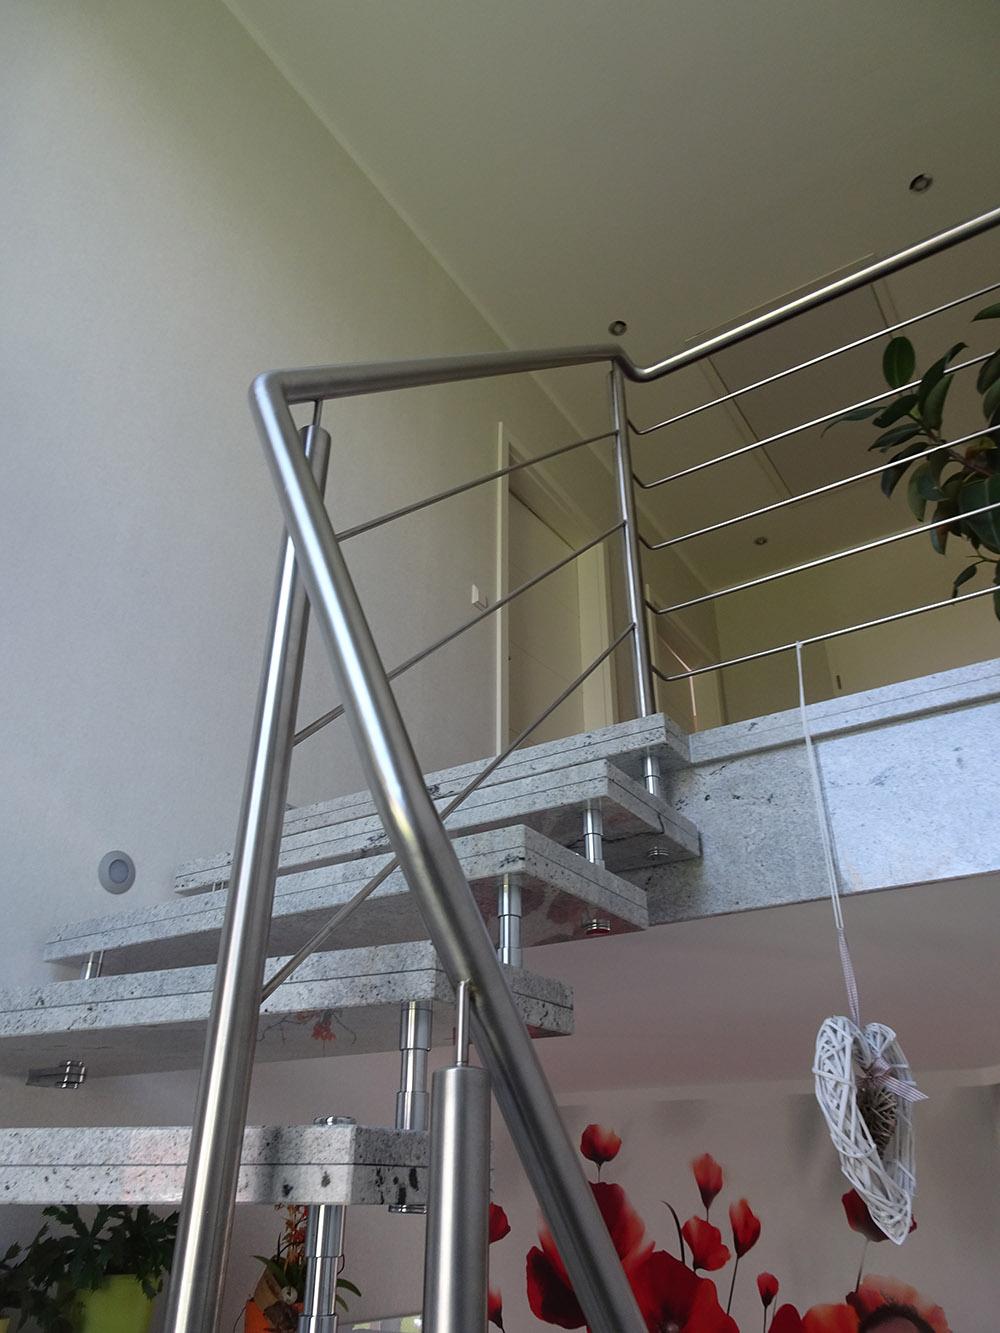 berliner edelstahlbau und systemgel nder gel nder aus edelstahl treppen aus edelstahl. Black Bedroom Furniture Sets. Home Design Ideas